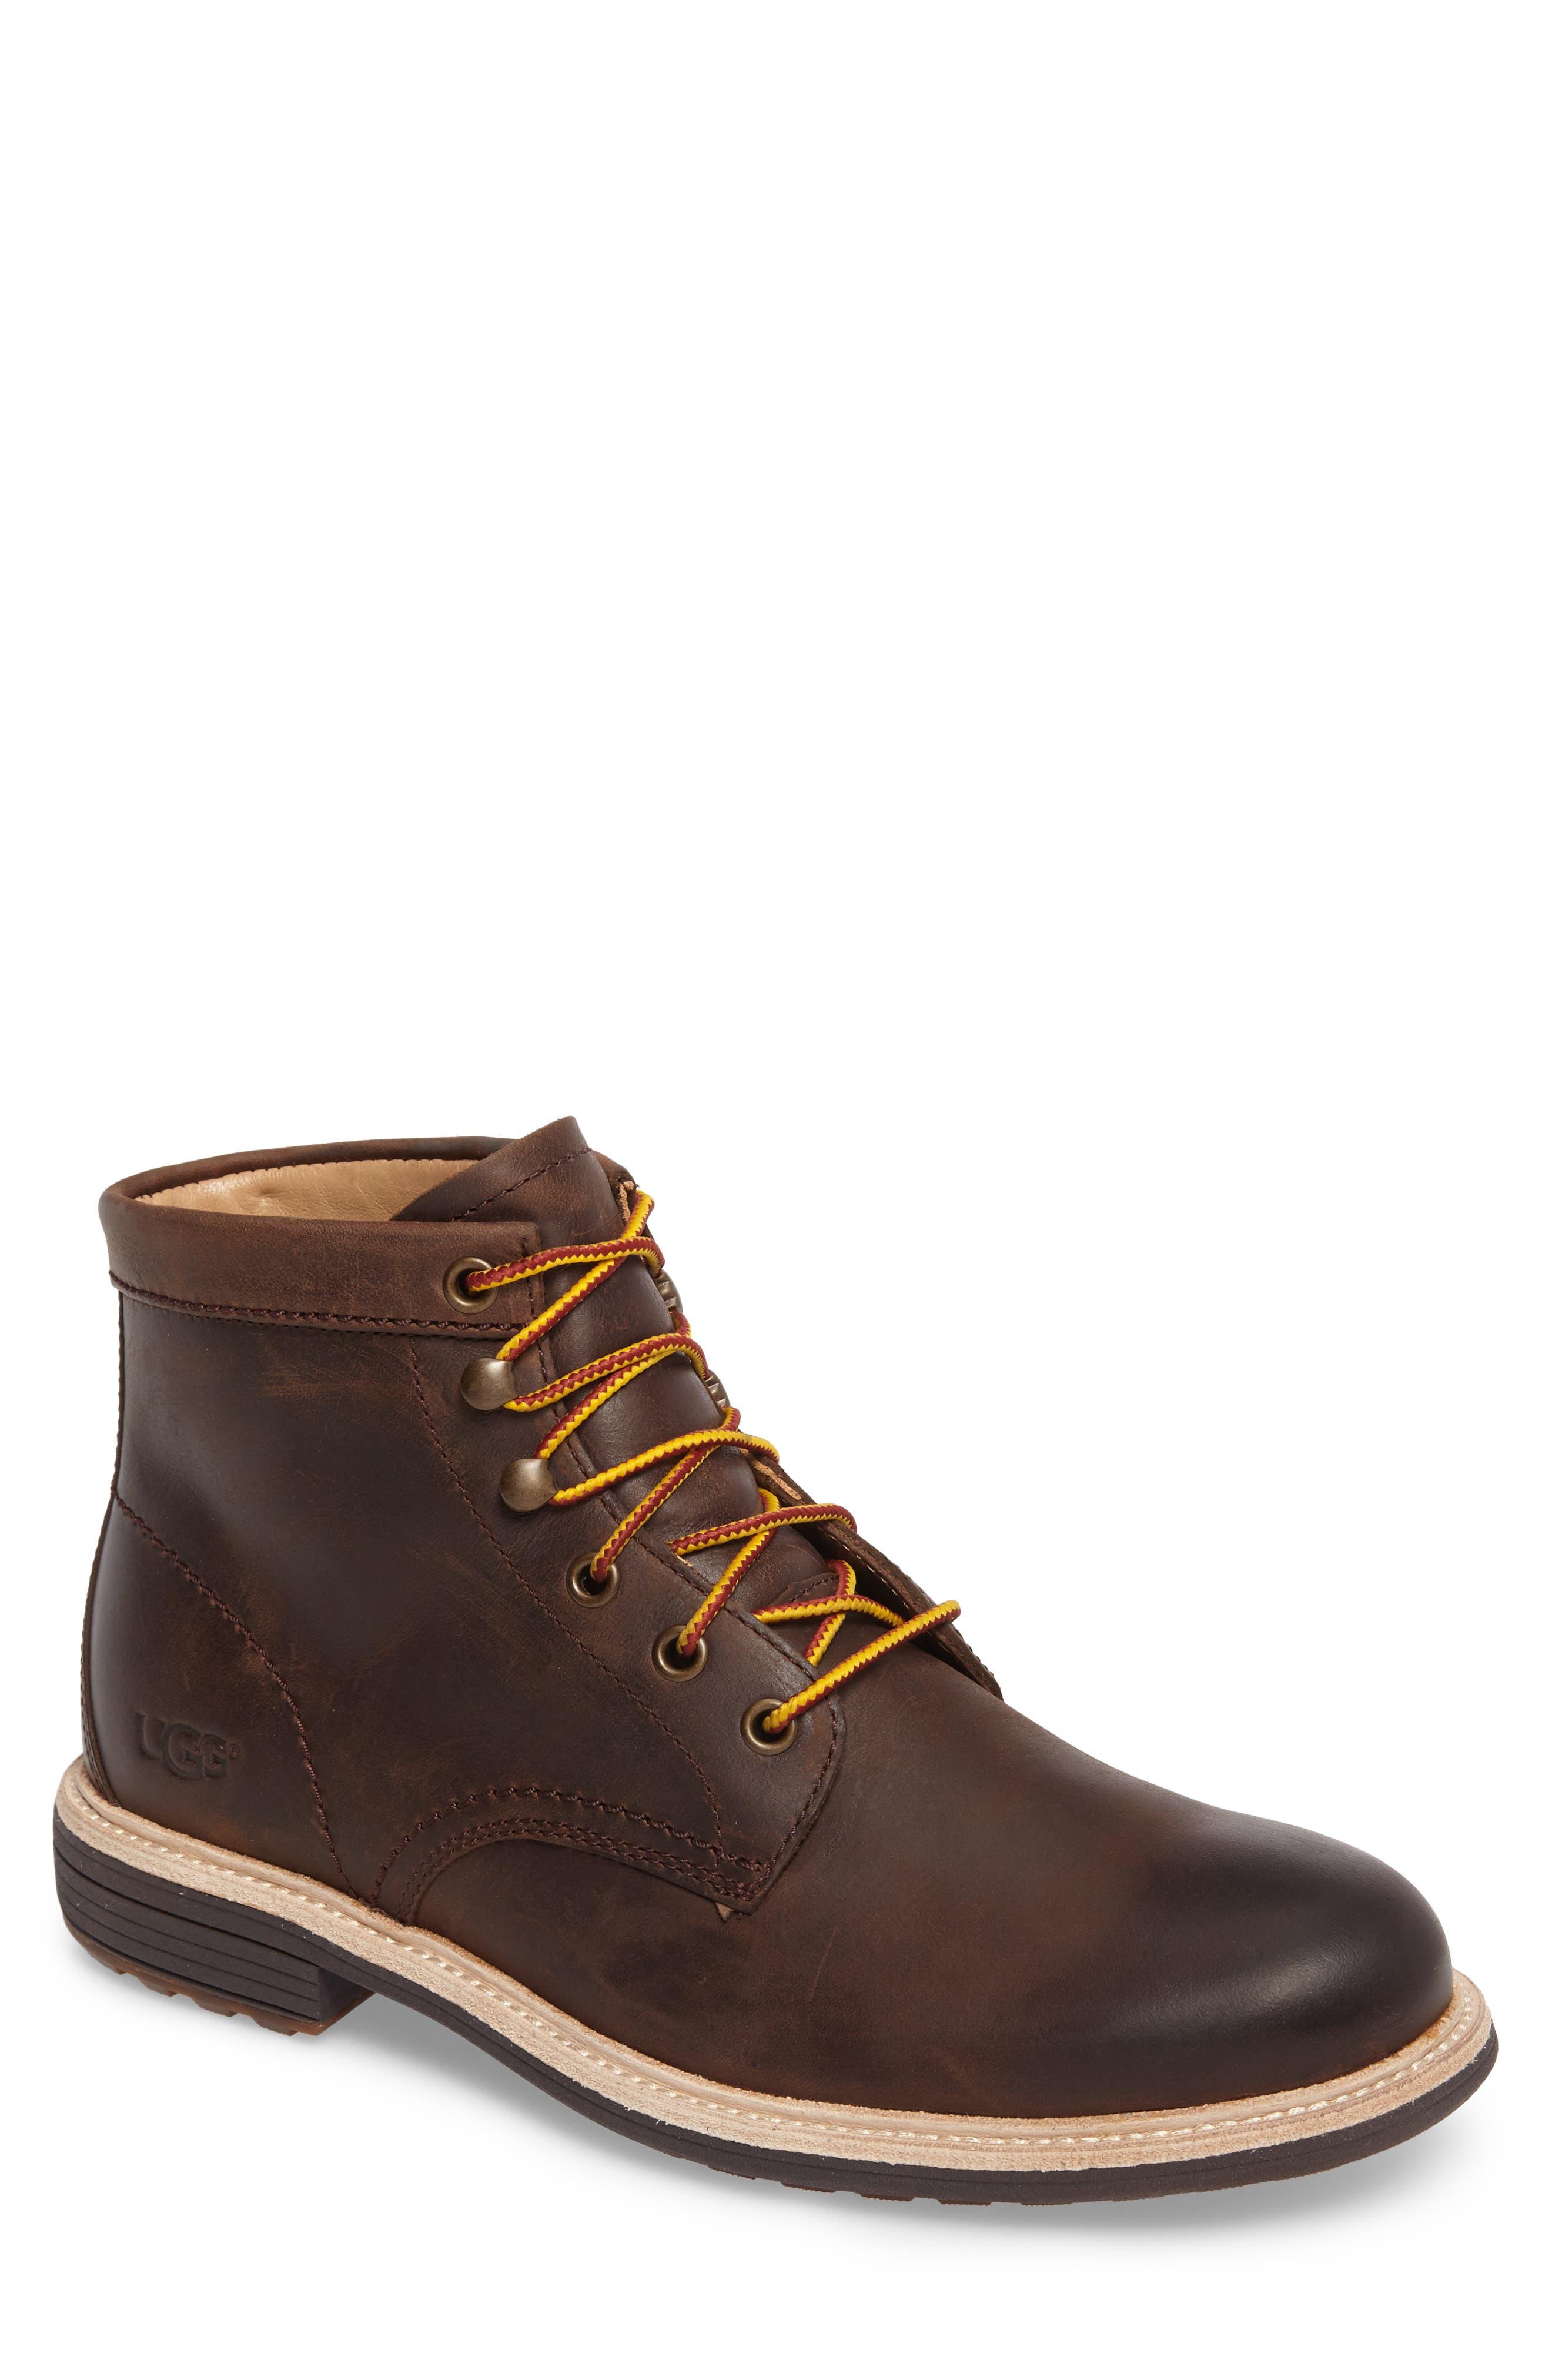 Vestmar Plain Toe Boot,                             Main thumbnail 1, color,                             Grizzly